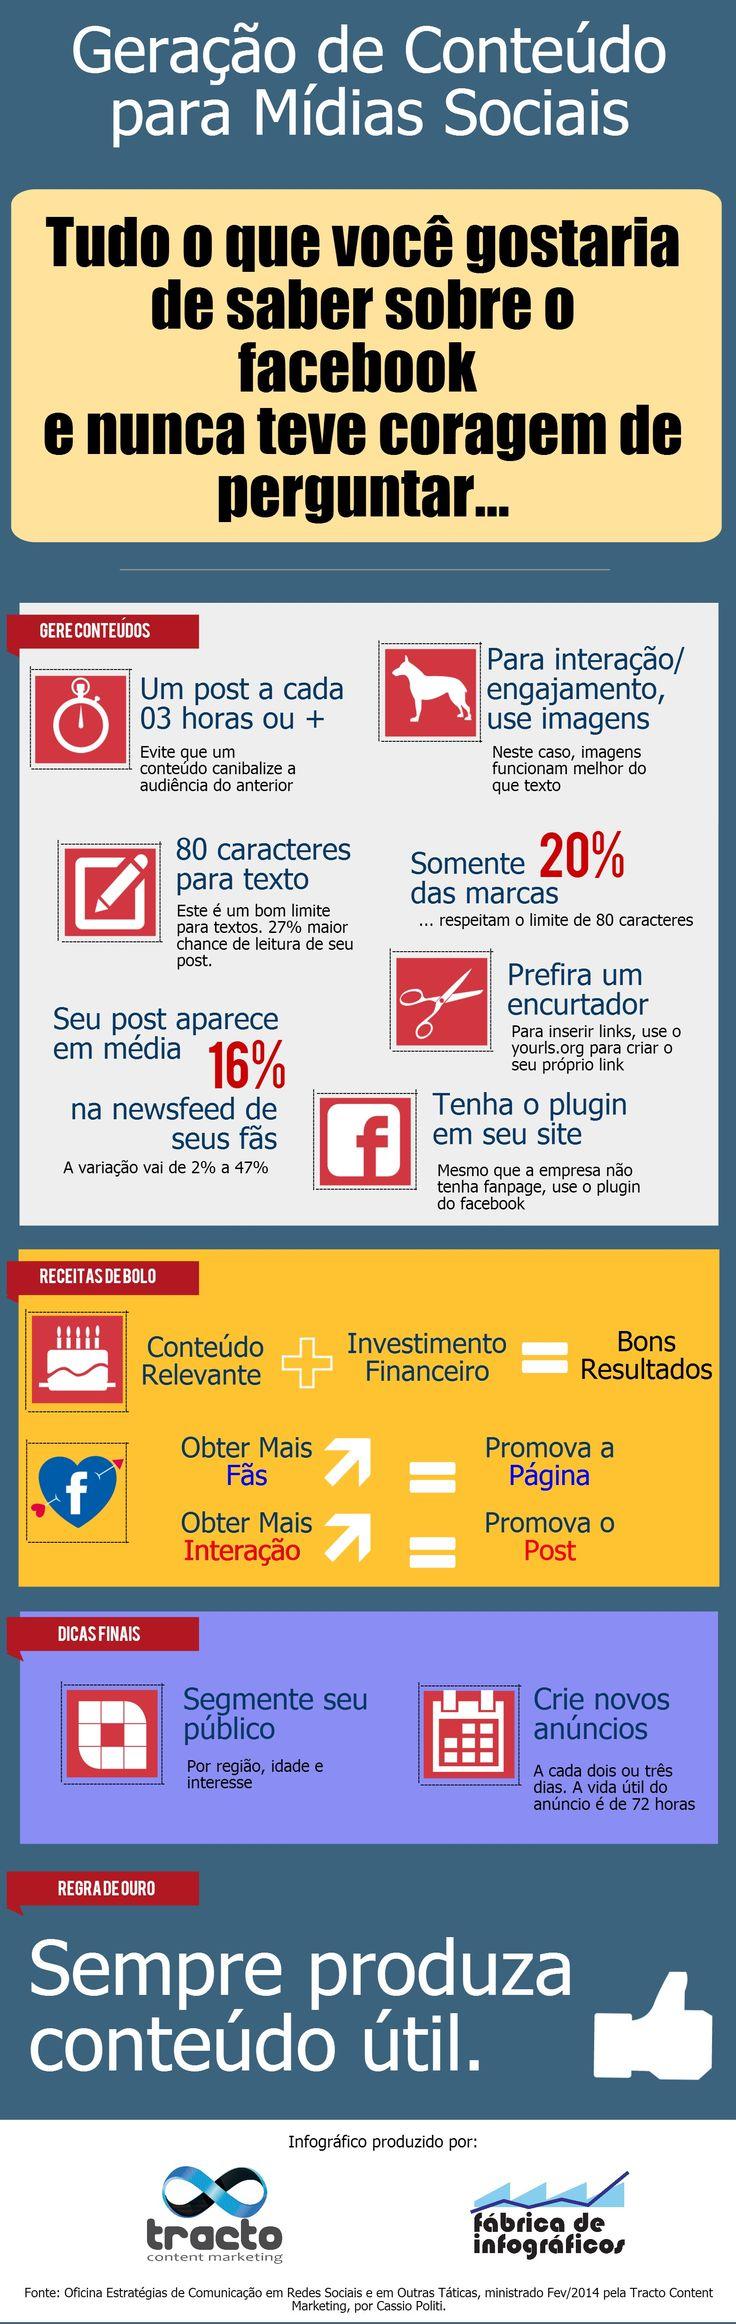 33 best corretor tech images on pinterest real estate broker marketing digital productivity evolution portugal masters social media starting a blog social media marketing restaurant fandeluxe Images